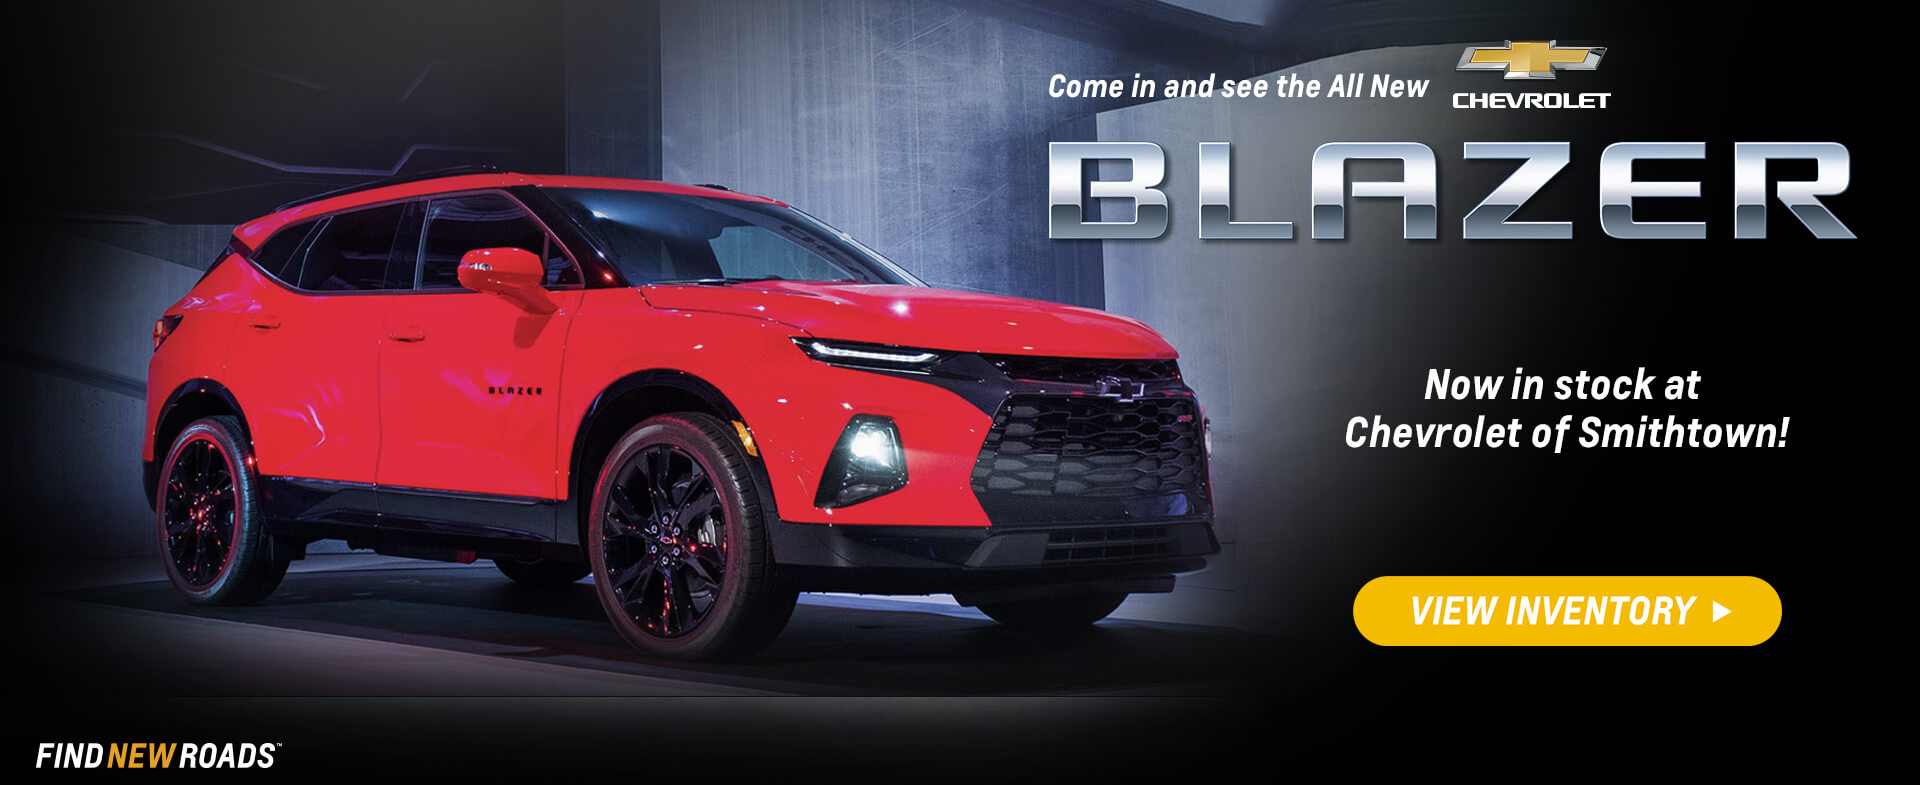 All New Chevrolet Blazer